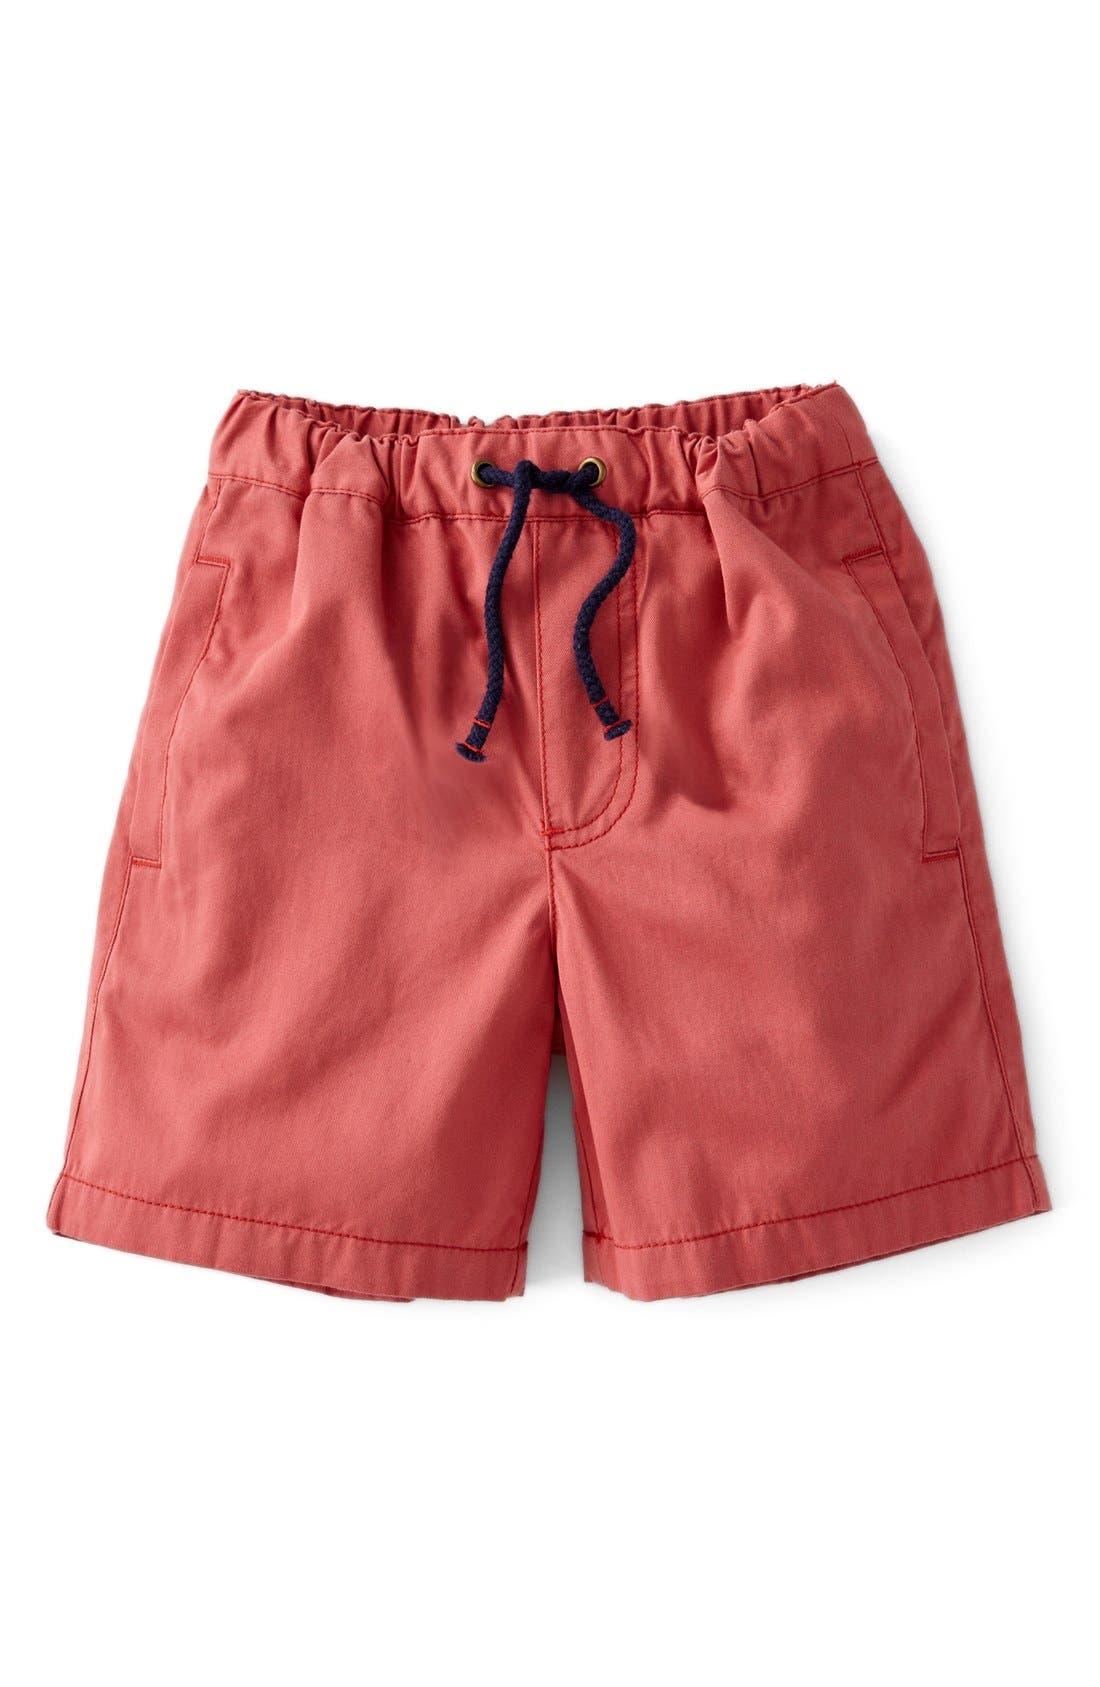 Alternate Image 1 Selected - Mini Boden Drawstring Shorts (Toddler Boys, Little Boys & Big Boys)